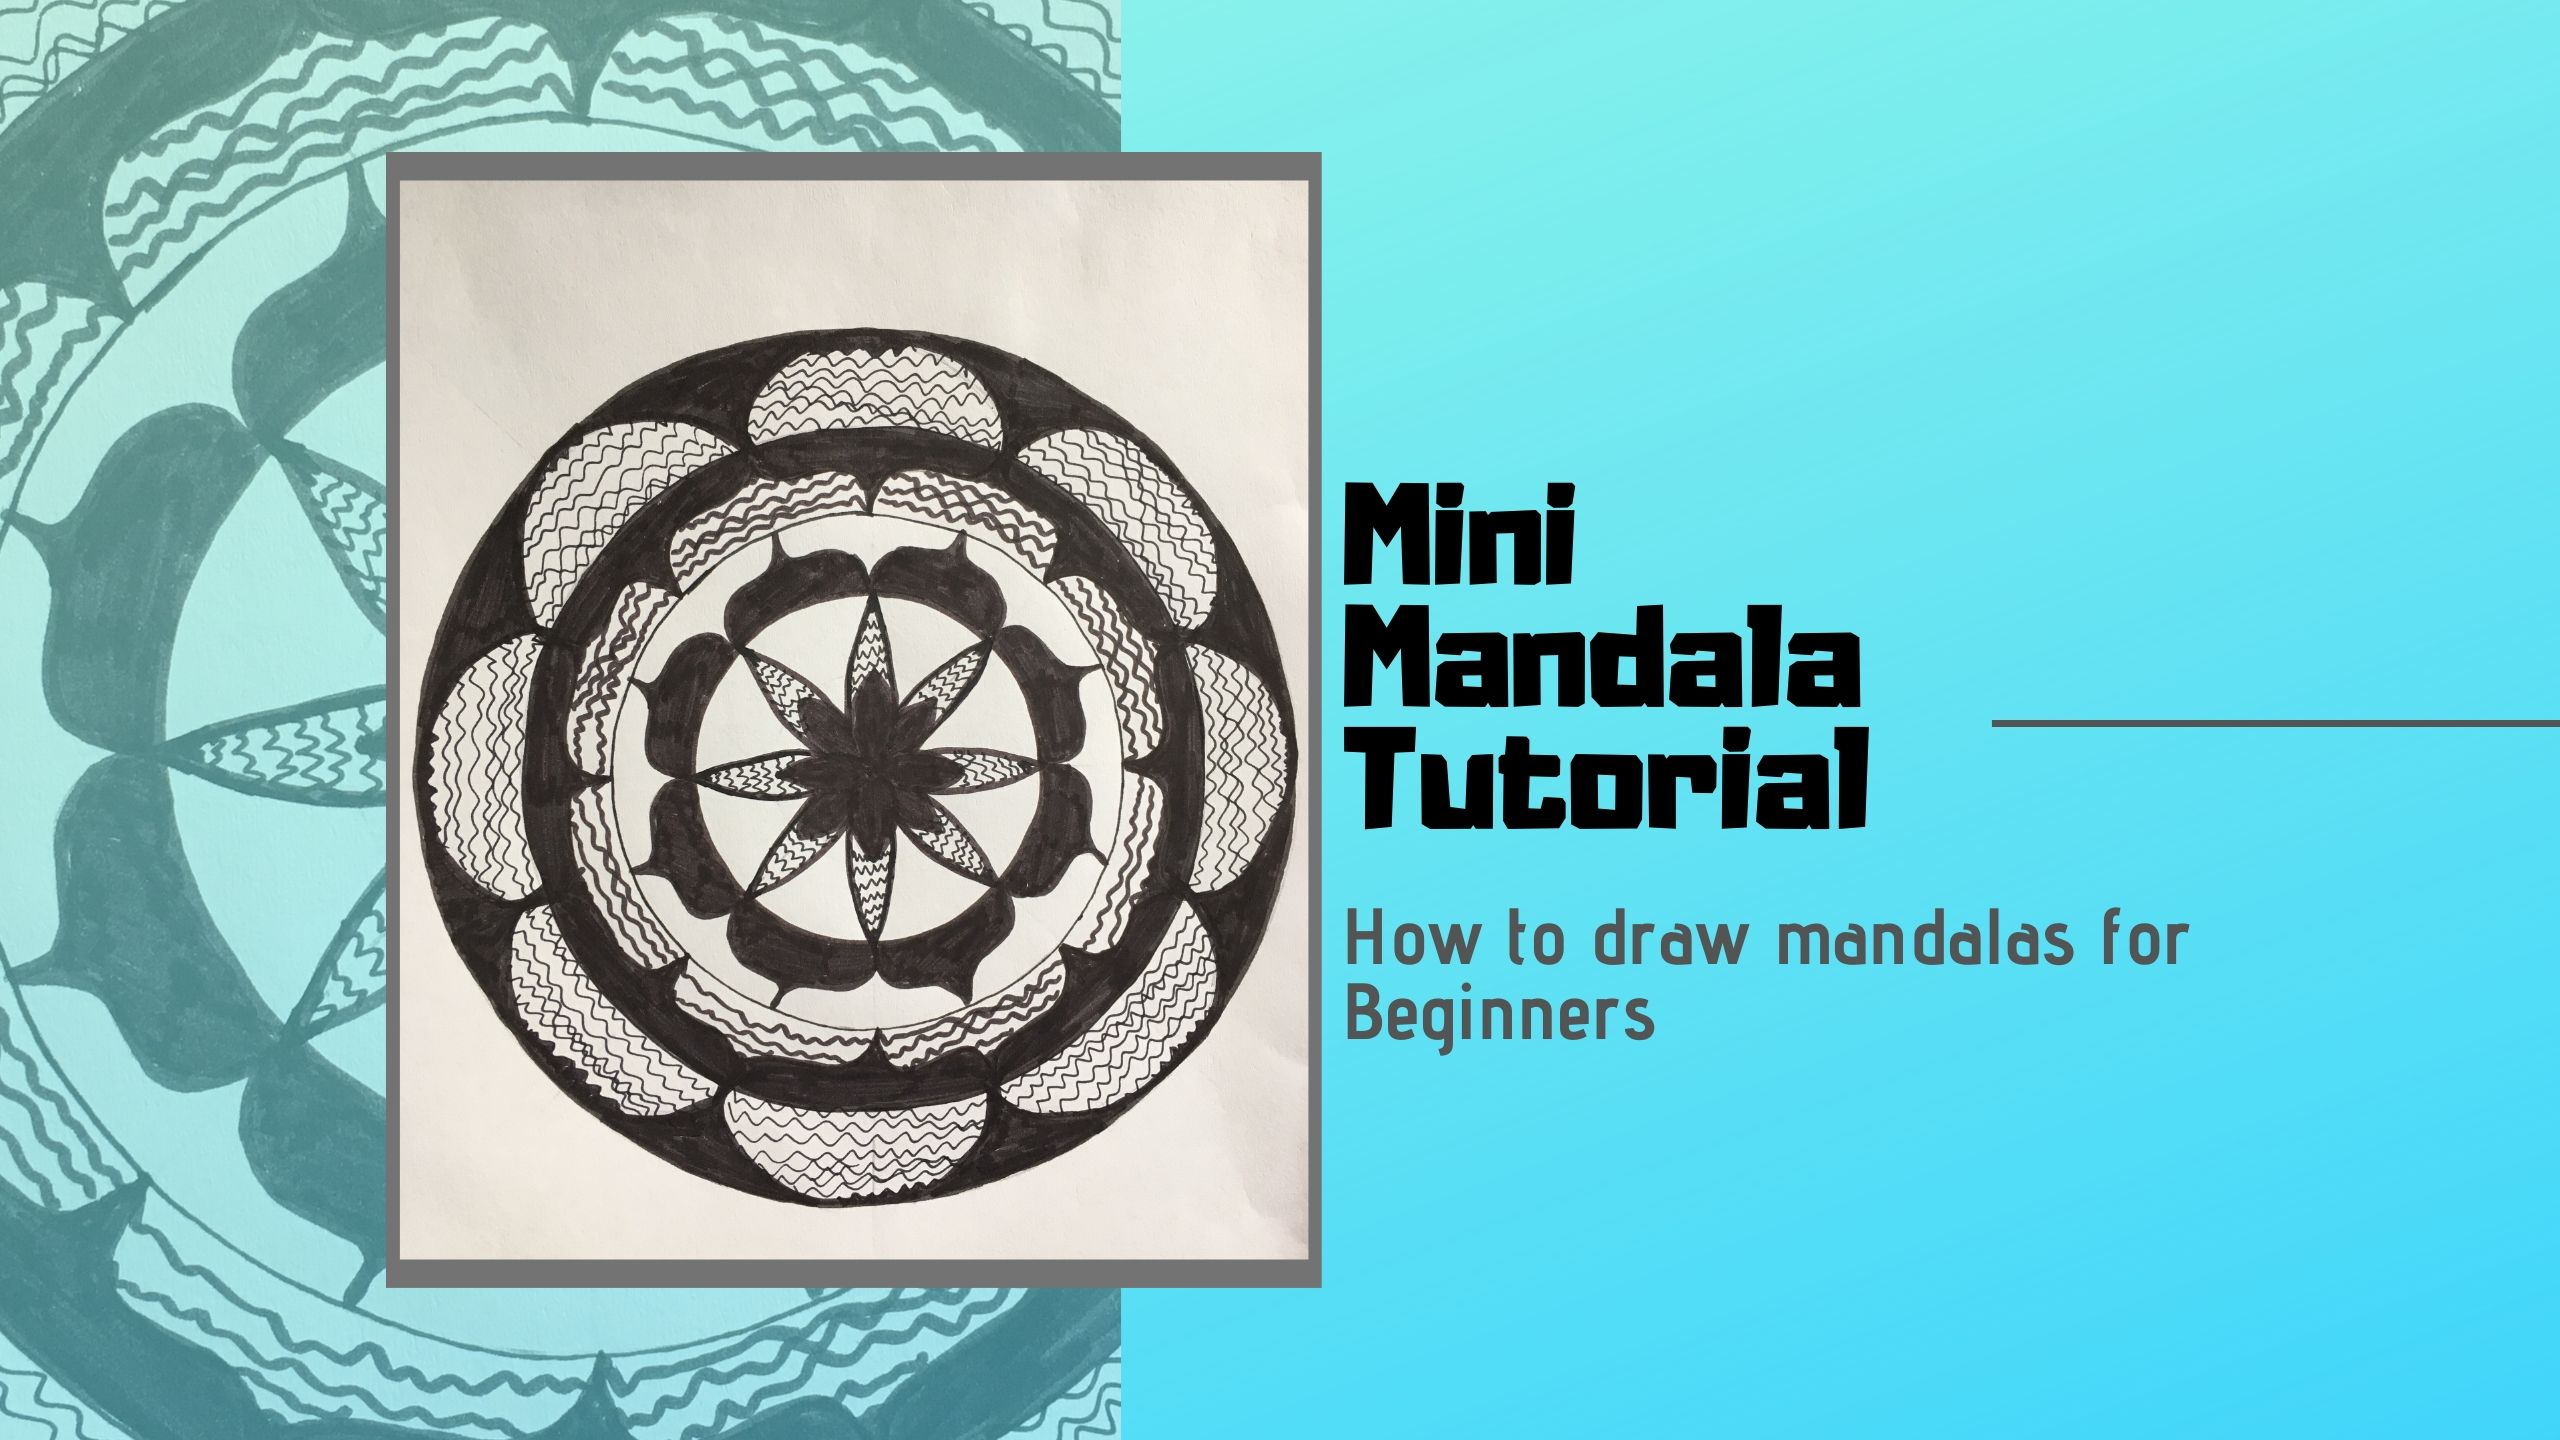 Mini How to draw Mandala Beginner Tutorial